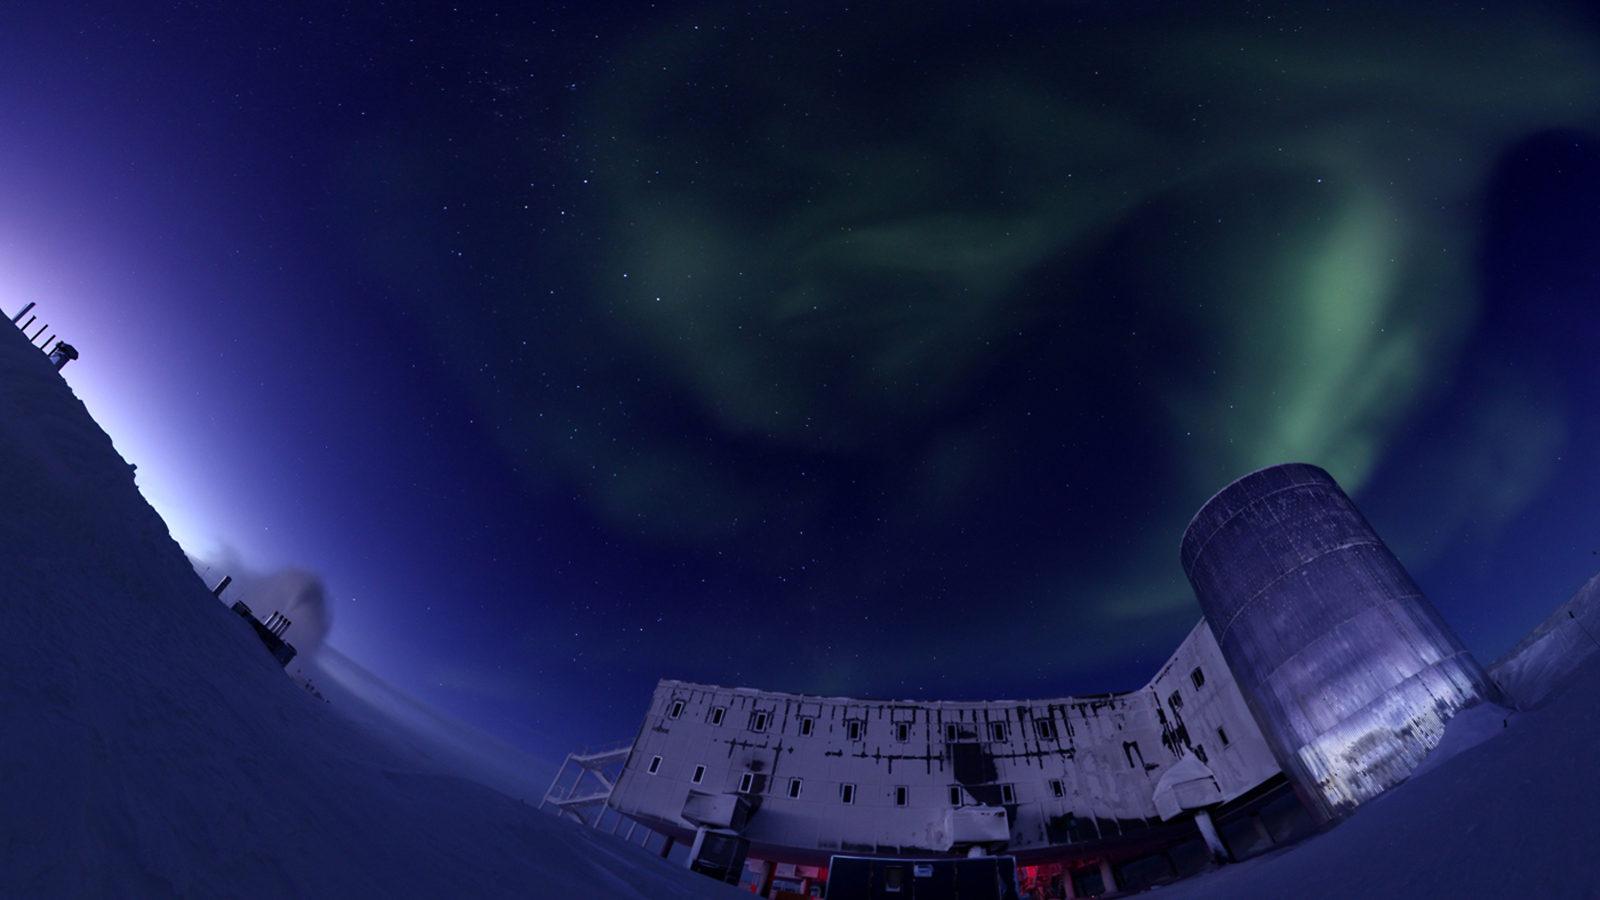 Photo of South Pole Telescope southern lights